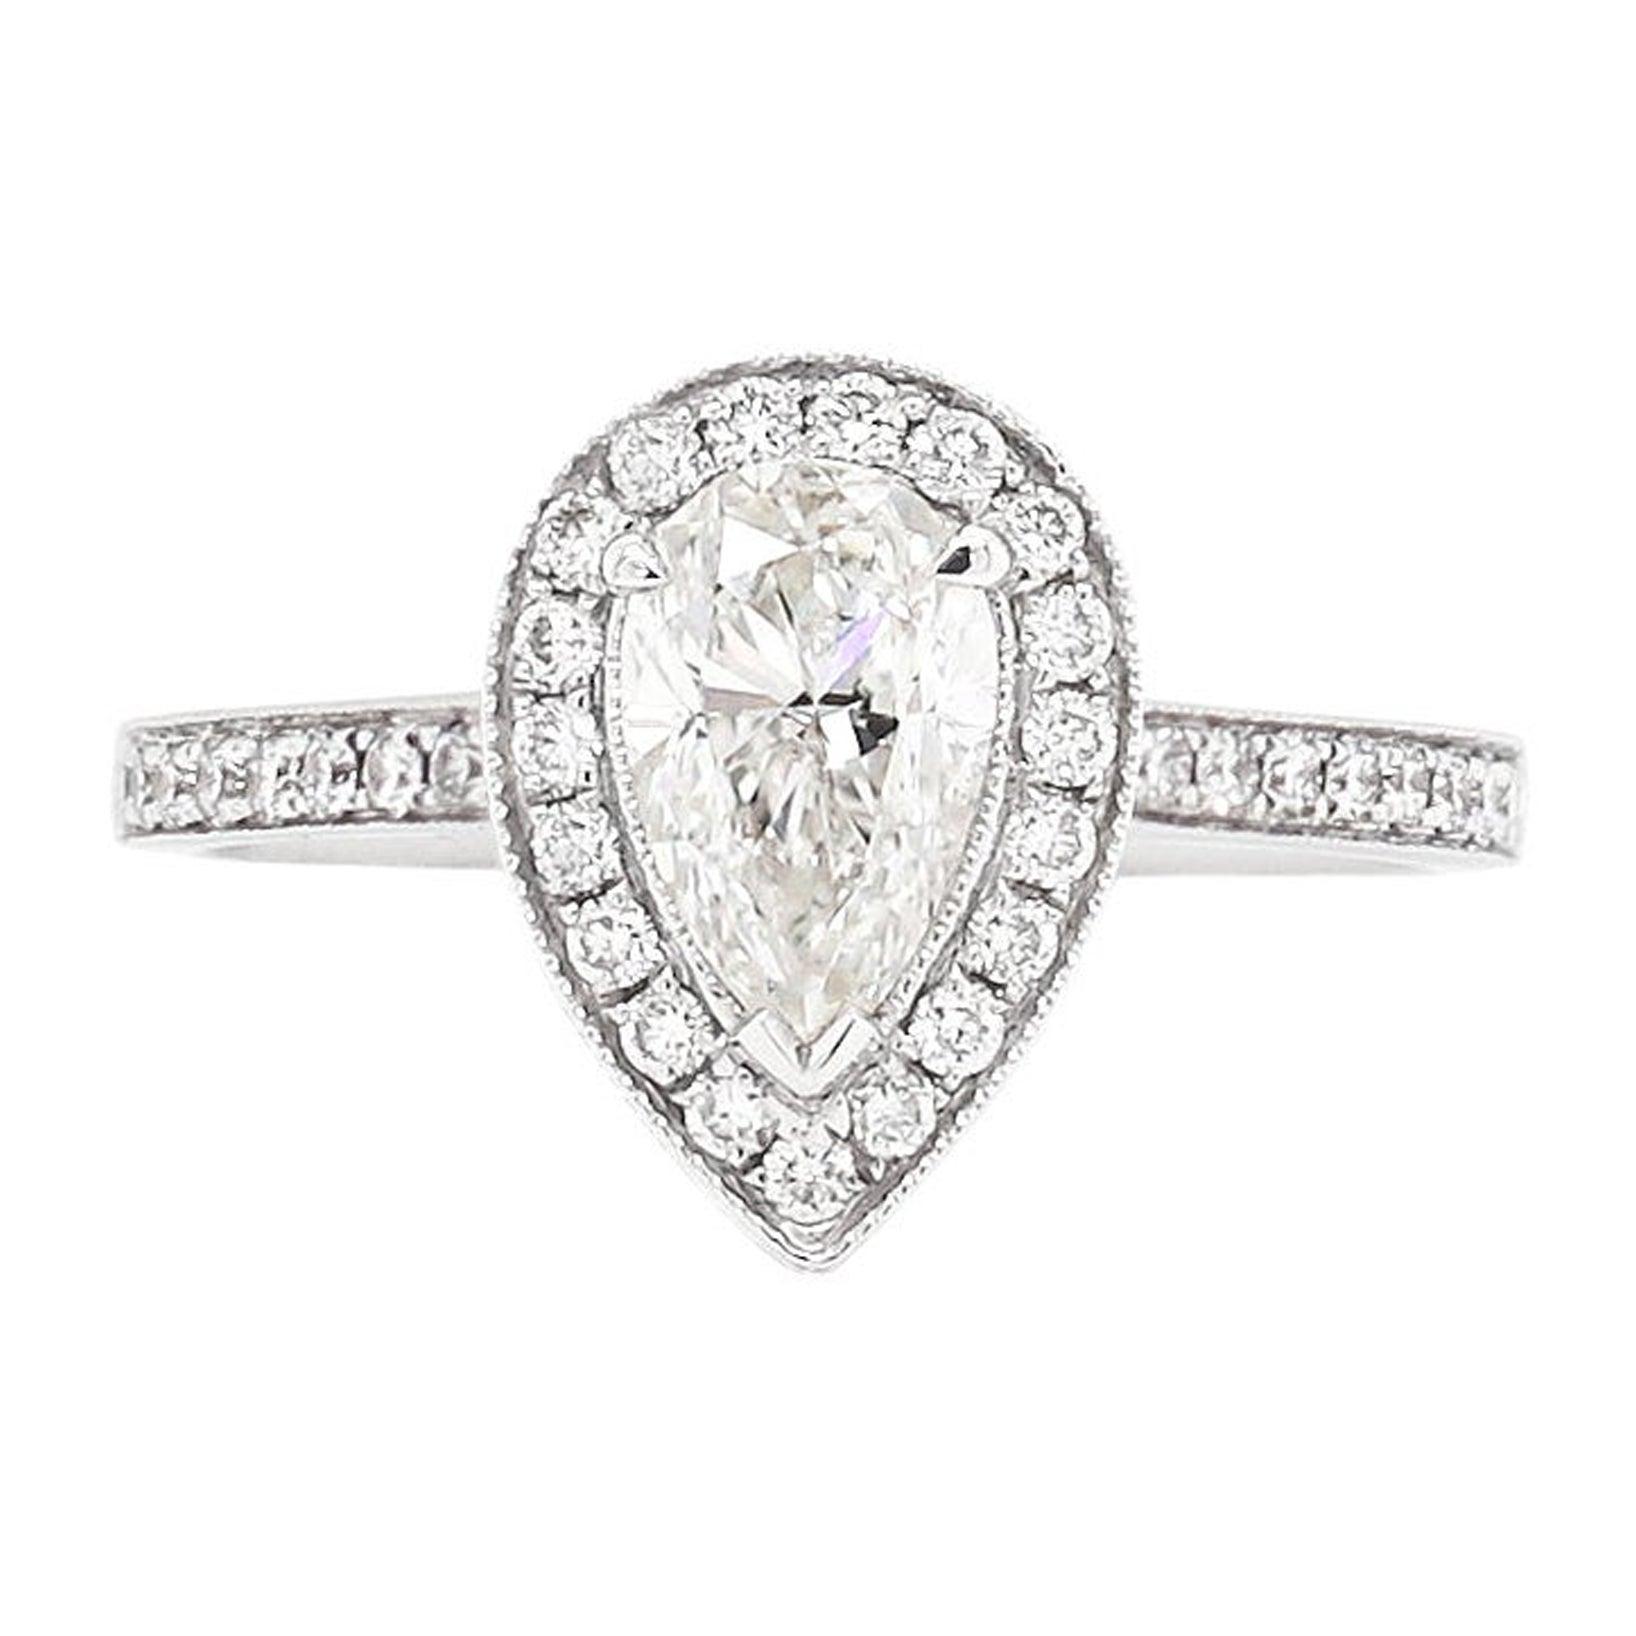 1.01 Carat G SI1 Pear Shape Diamond Halo 18 Carat White Gold Engagement Ring